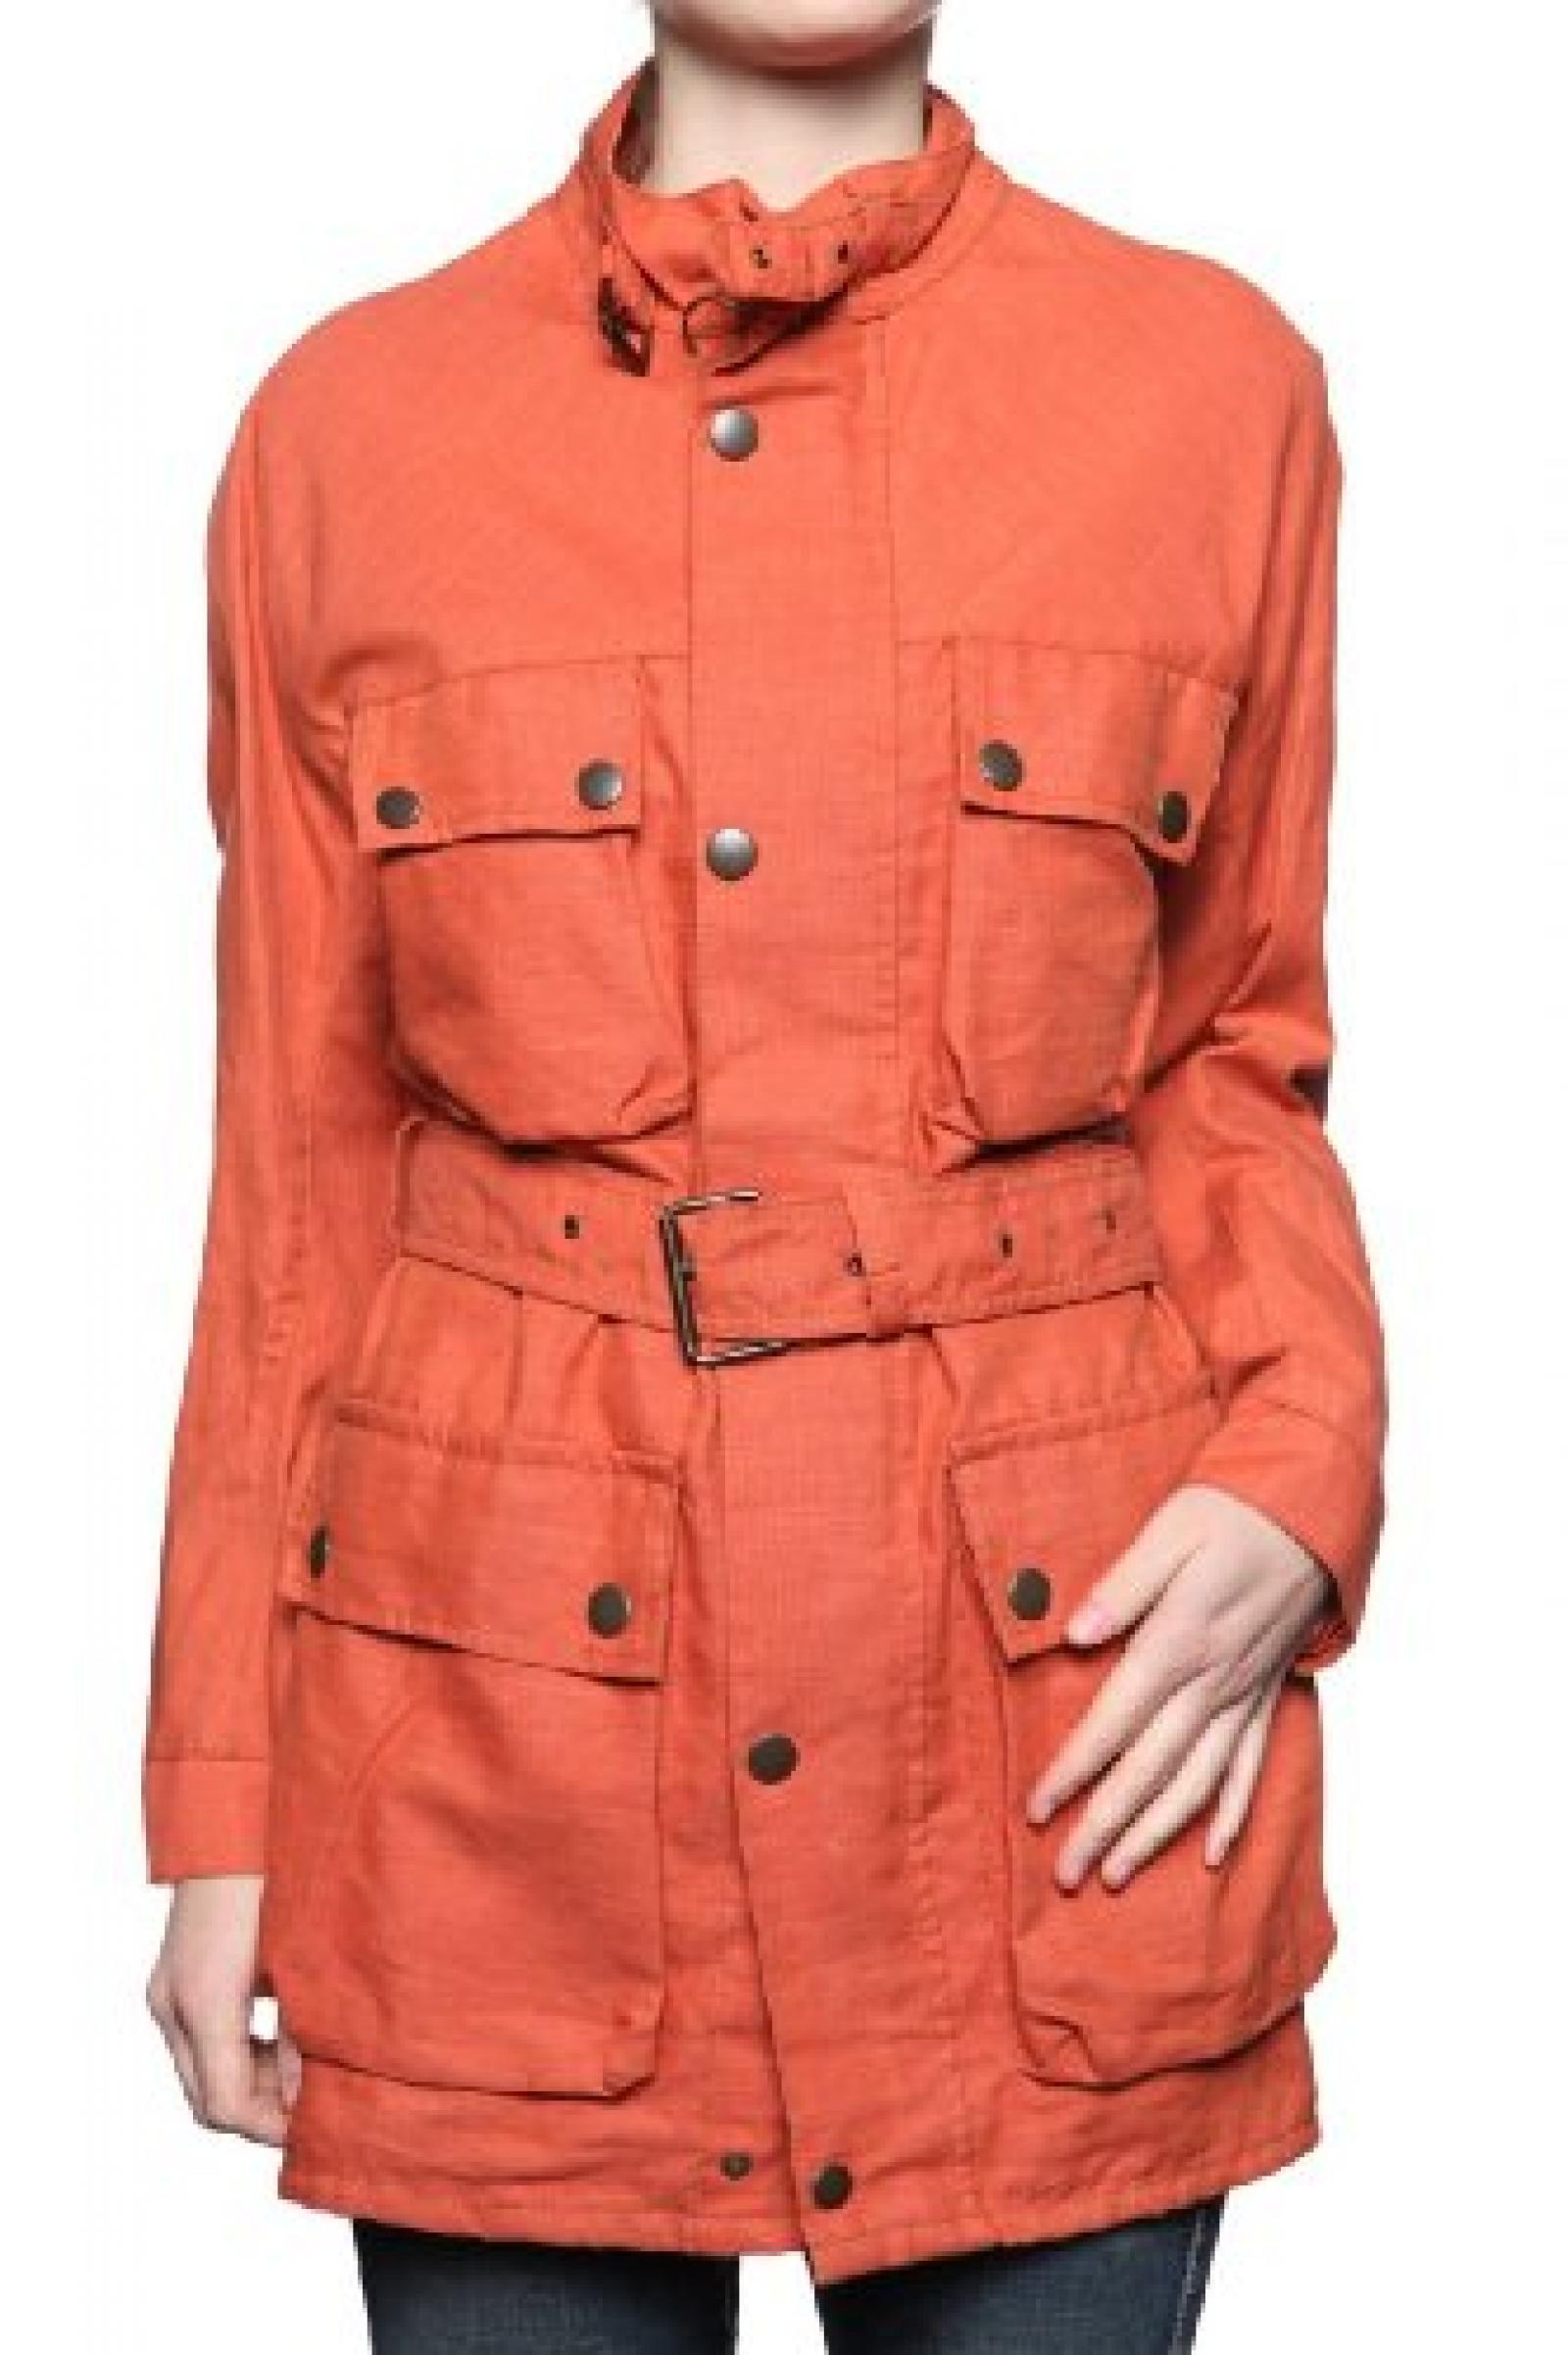 Belstaff Damen Jacke XL500 DAHAMRASALA, Farbe: Orange